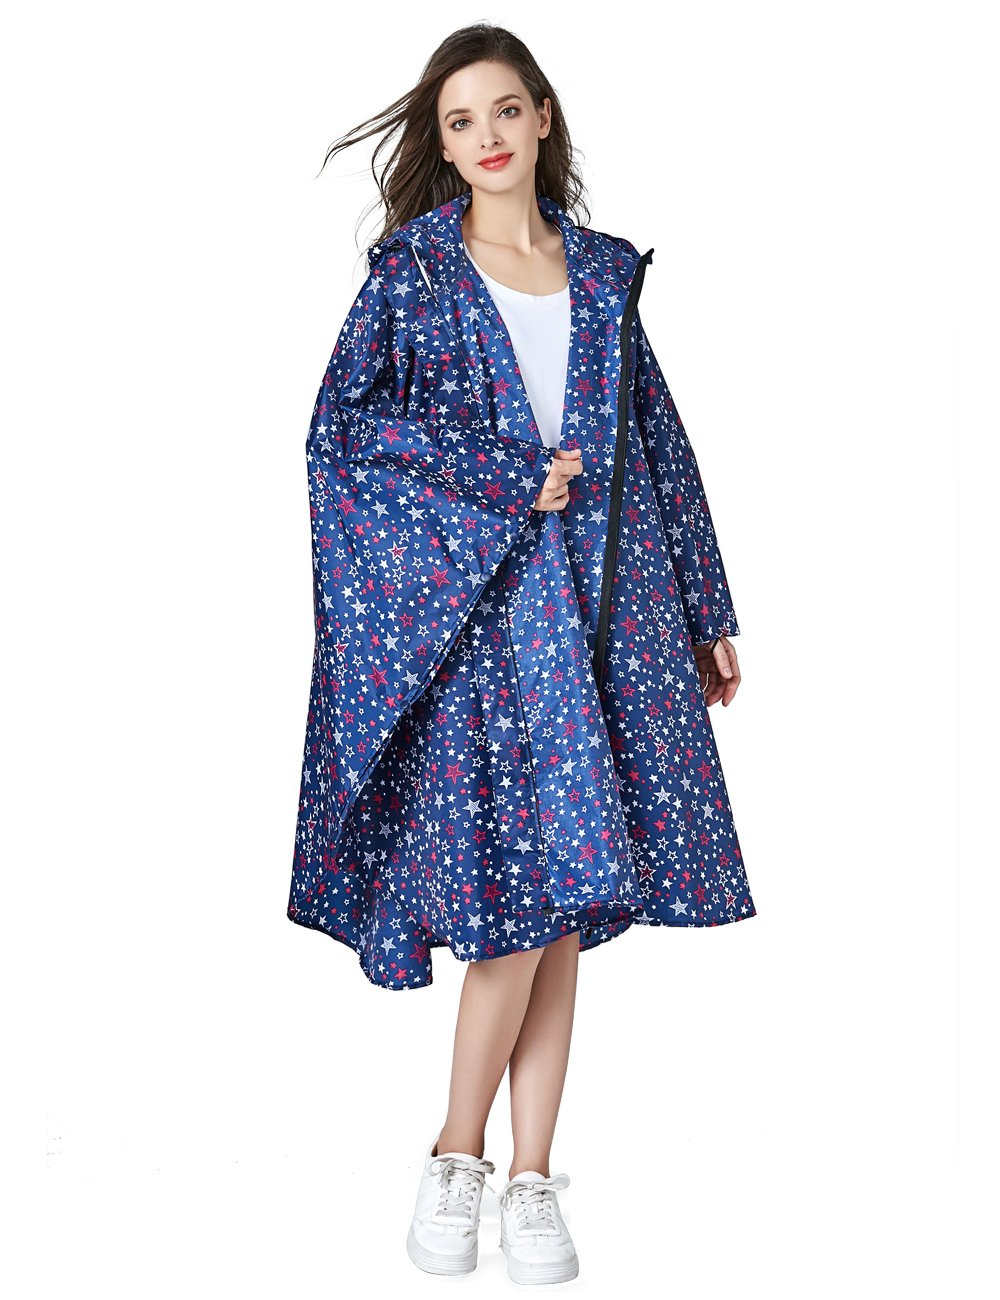 LOHASCASA Unisex Rain Ponchos Running Waterproof for Adults Rain Coat Jacket Windbreak Rainproof Jacket for Womens Foldable Raincoat Outdoor with Zipper Hooded Bike Rainning Coat Rainwear Navy Blue